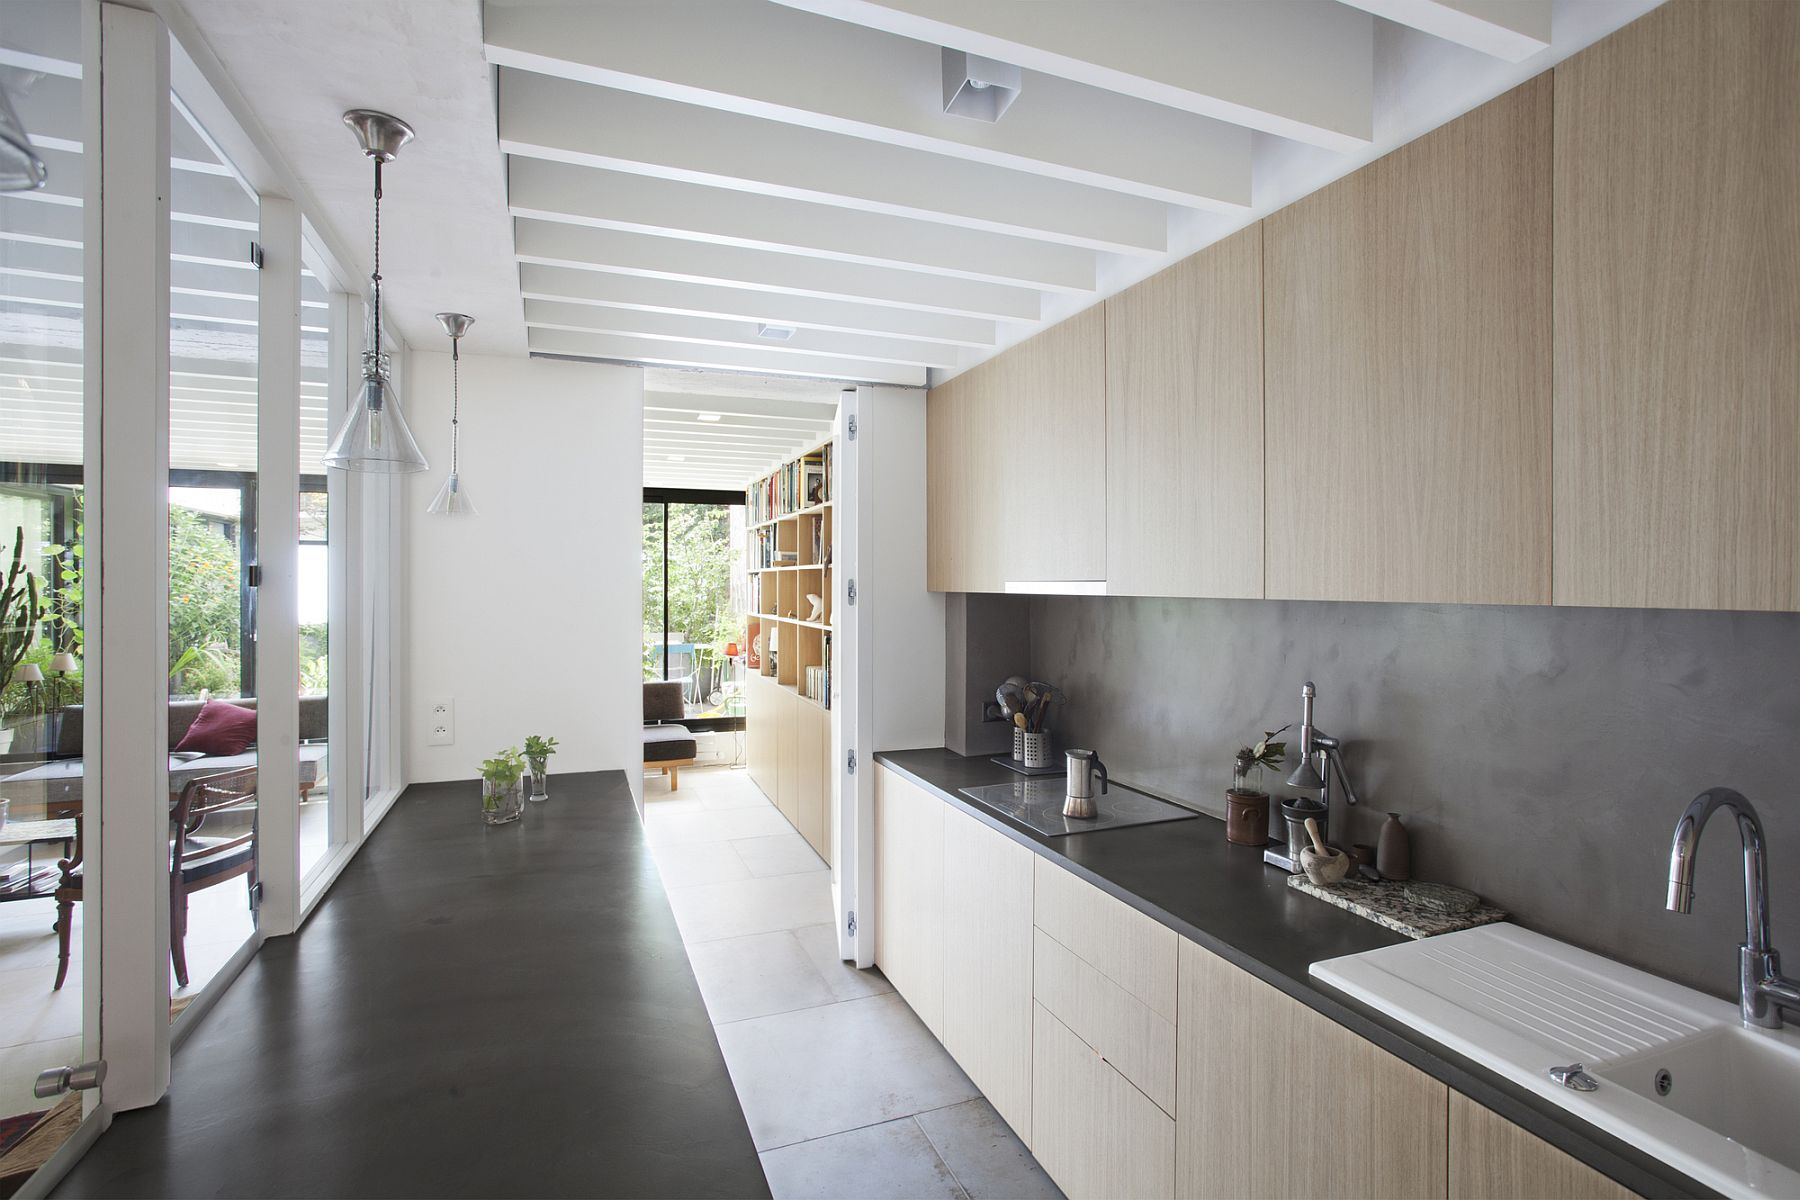 Wooden cabinets and dark kitchen countertops shape the stylish kitchen